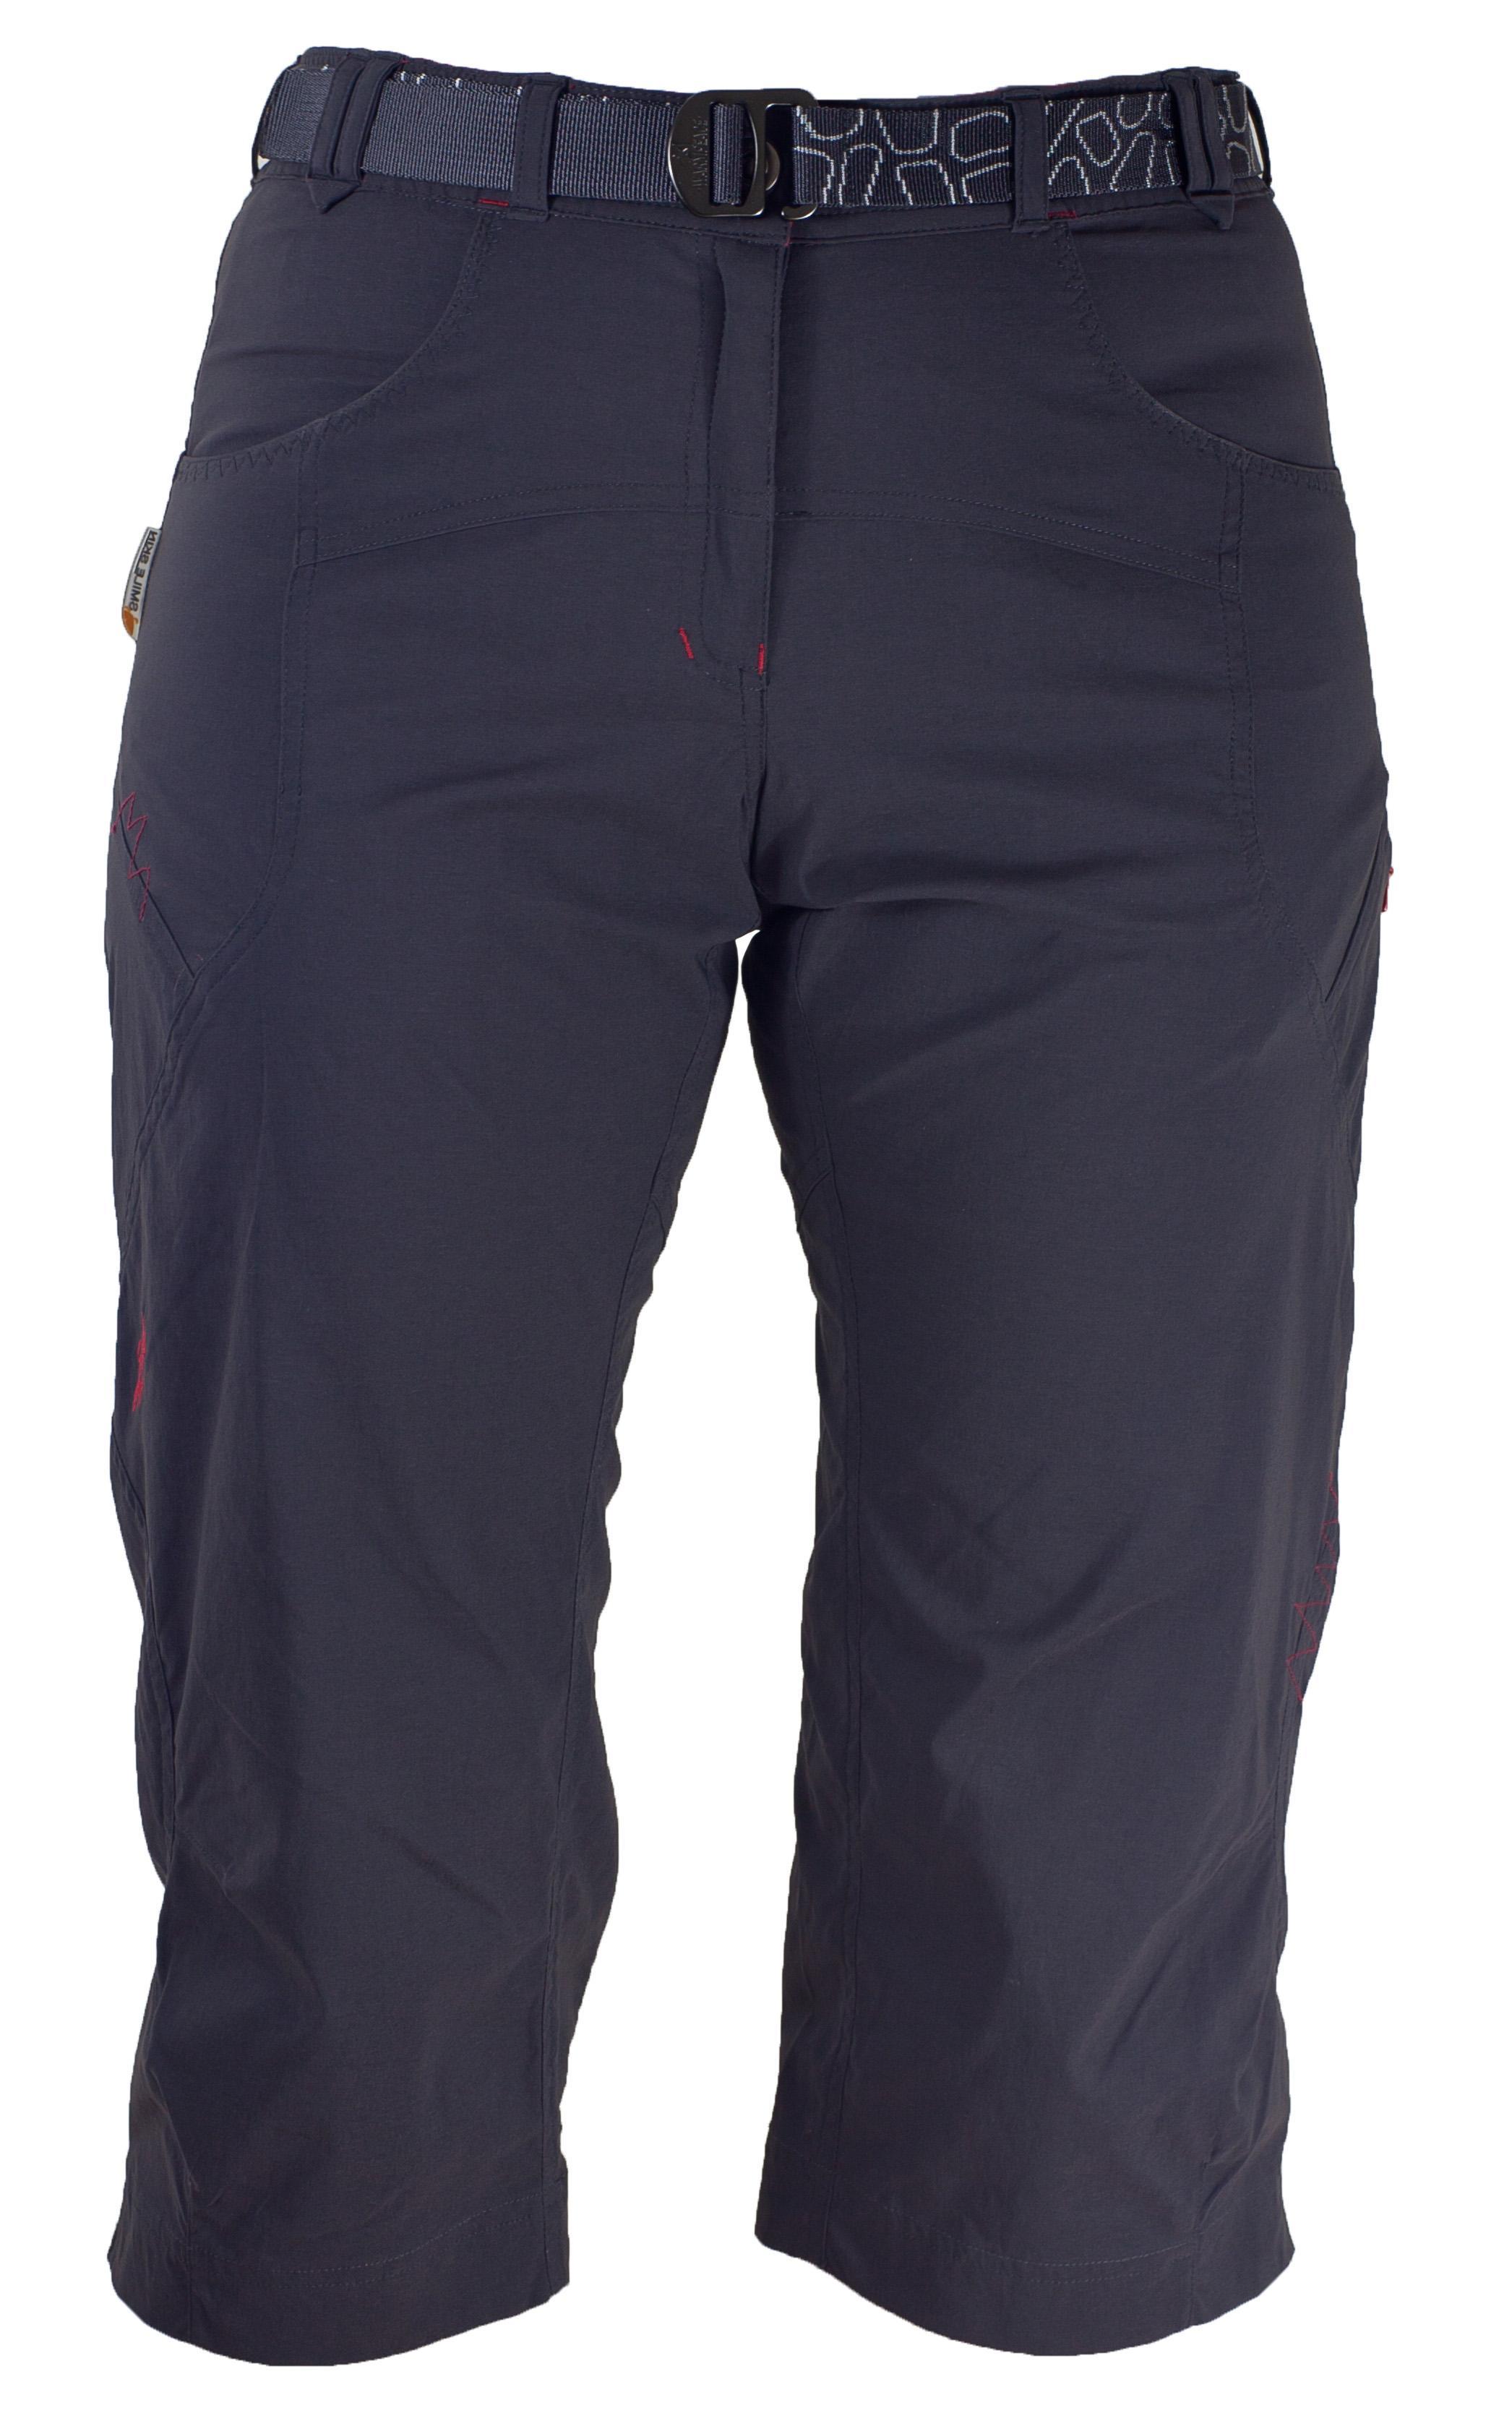 Pantaloni Warmpeace Flex 3/4 Lady - Negru